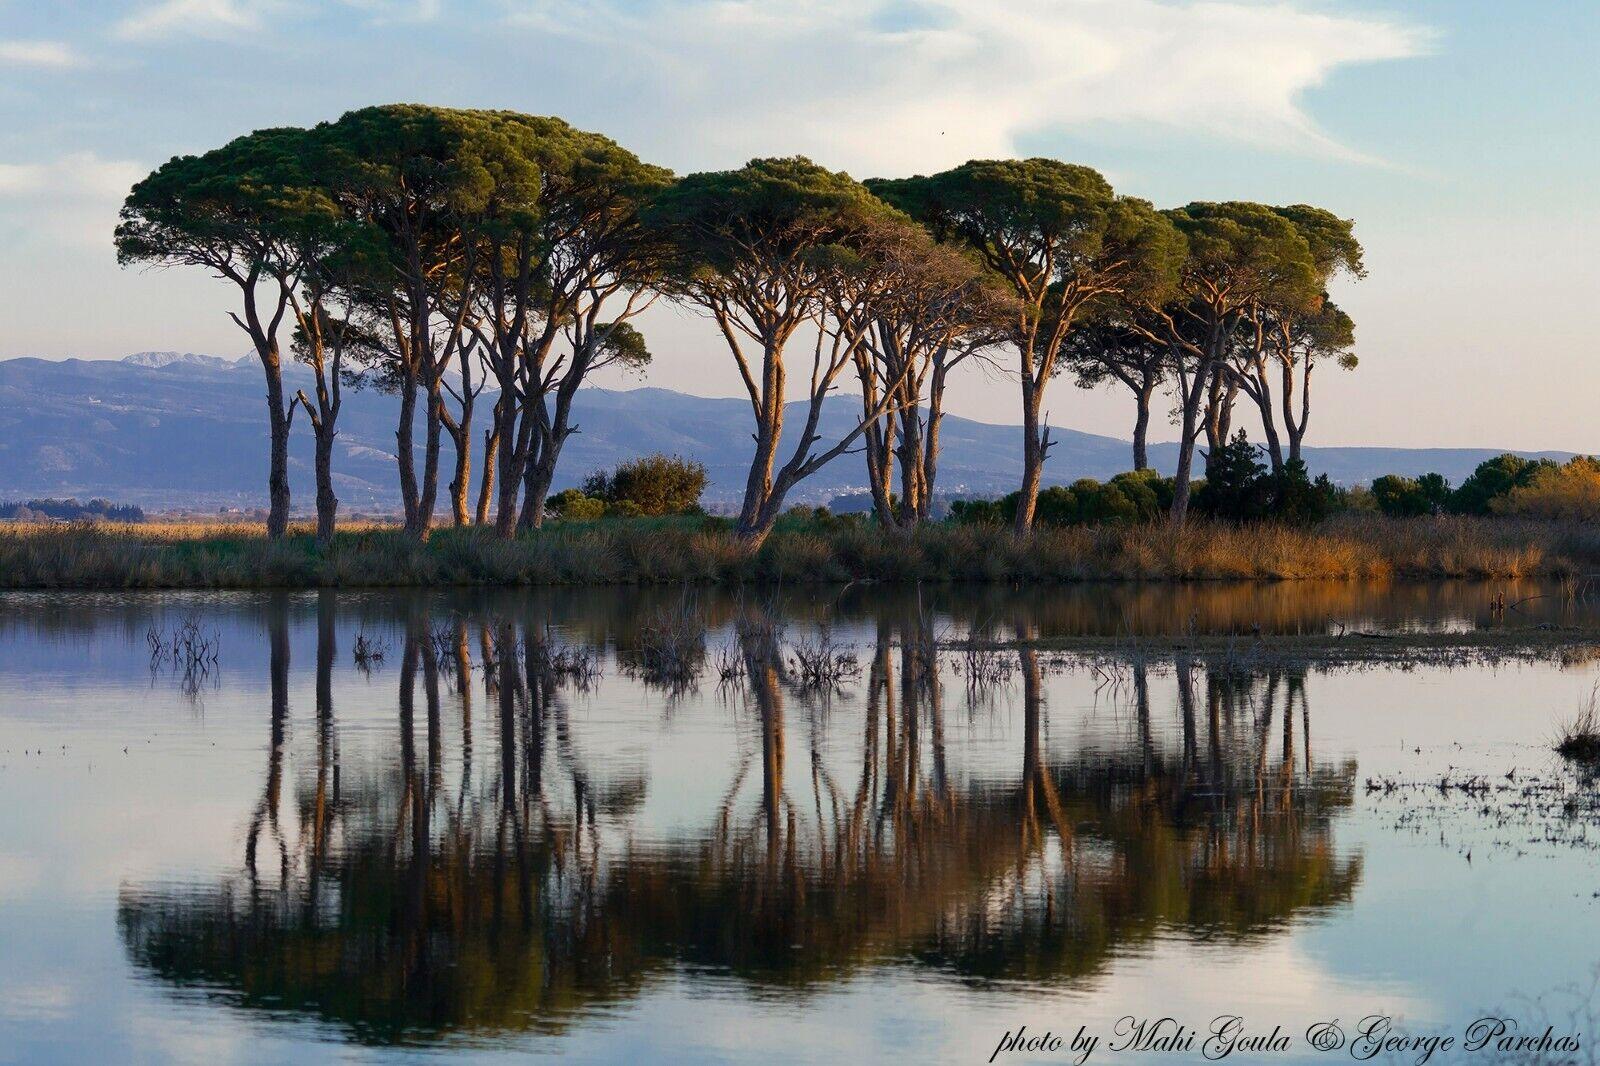 Italian Stone Pine Pinus Pinea Bonsai Or Edible Feature Bulk 25 Seeds For Sale Online Ebay